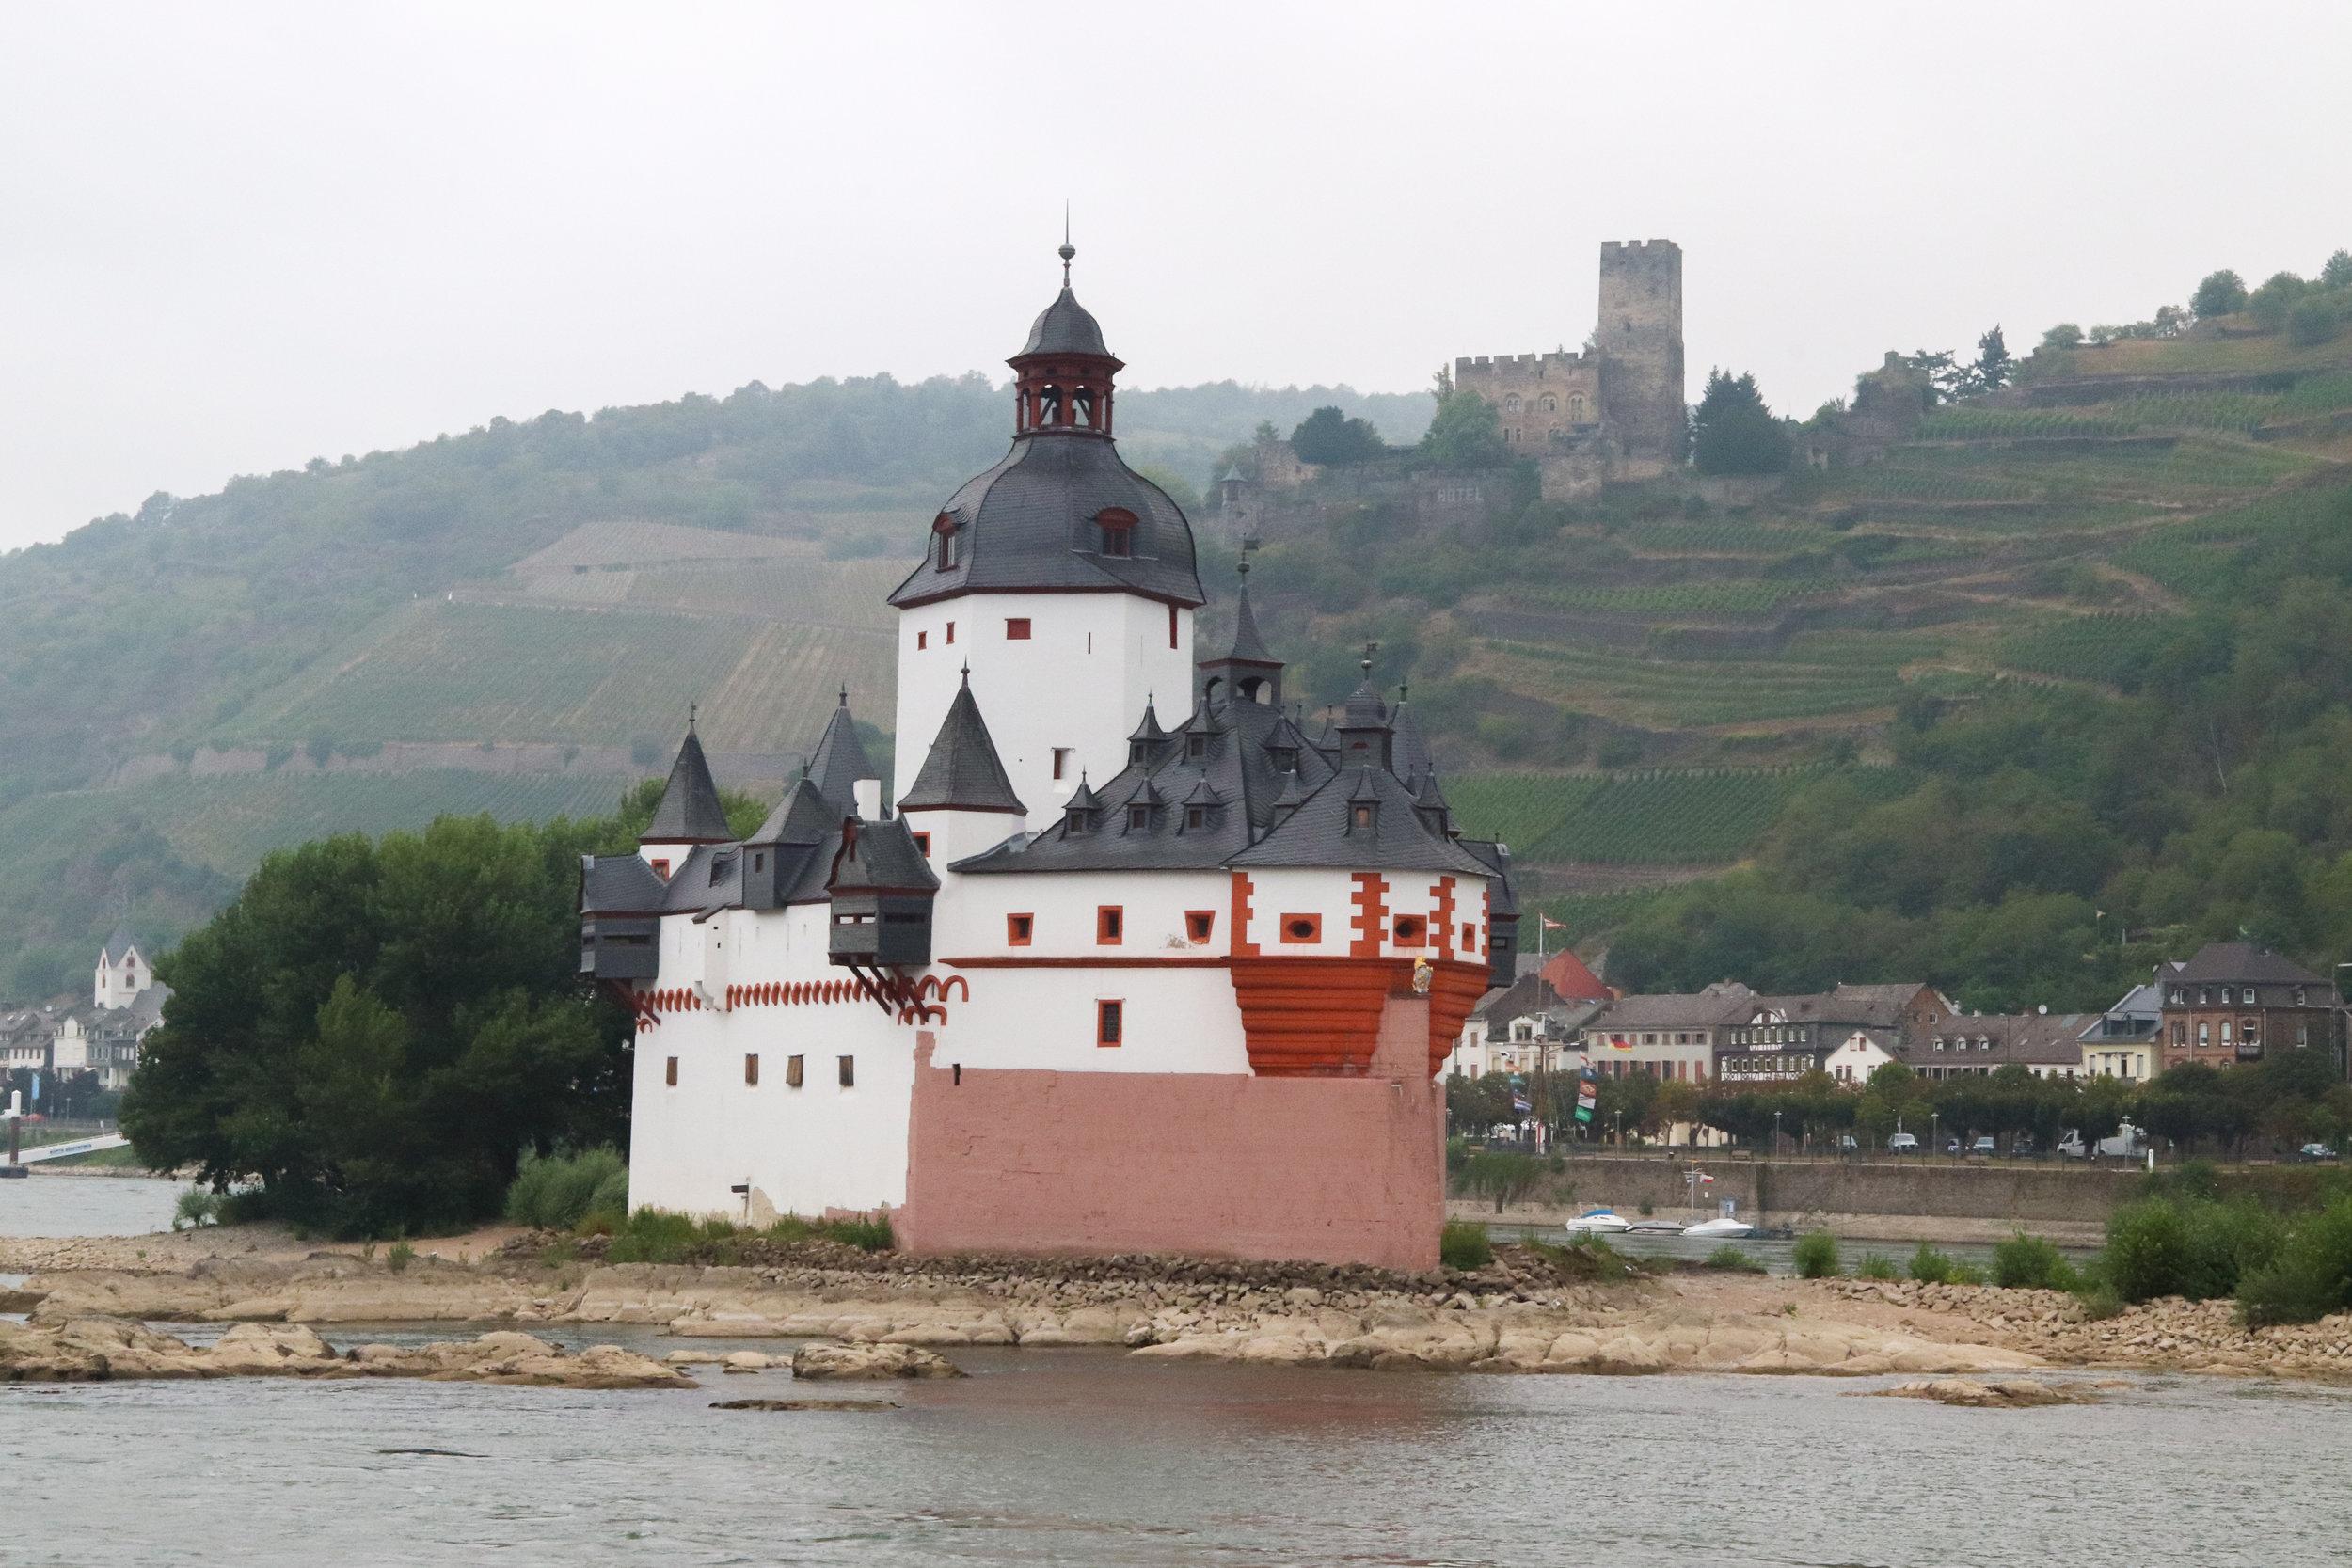 Pfalzgrafenstein Castle on the Rhine River in Germany